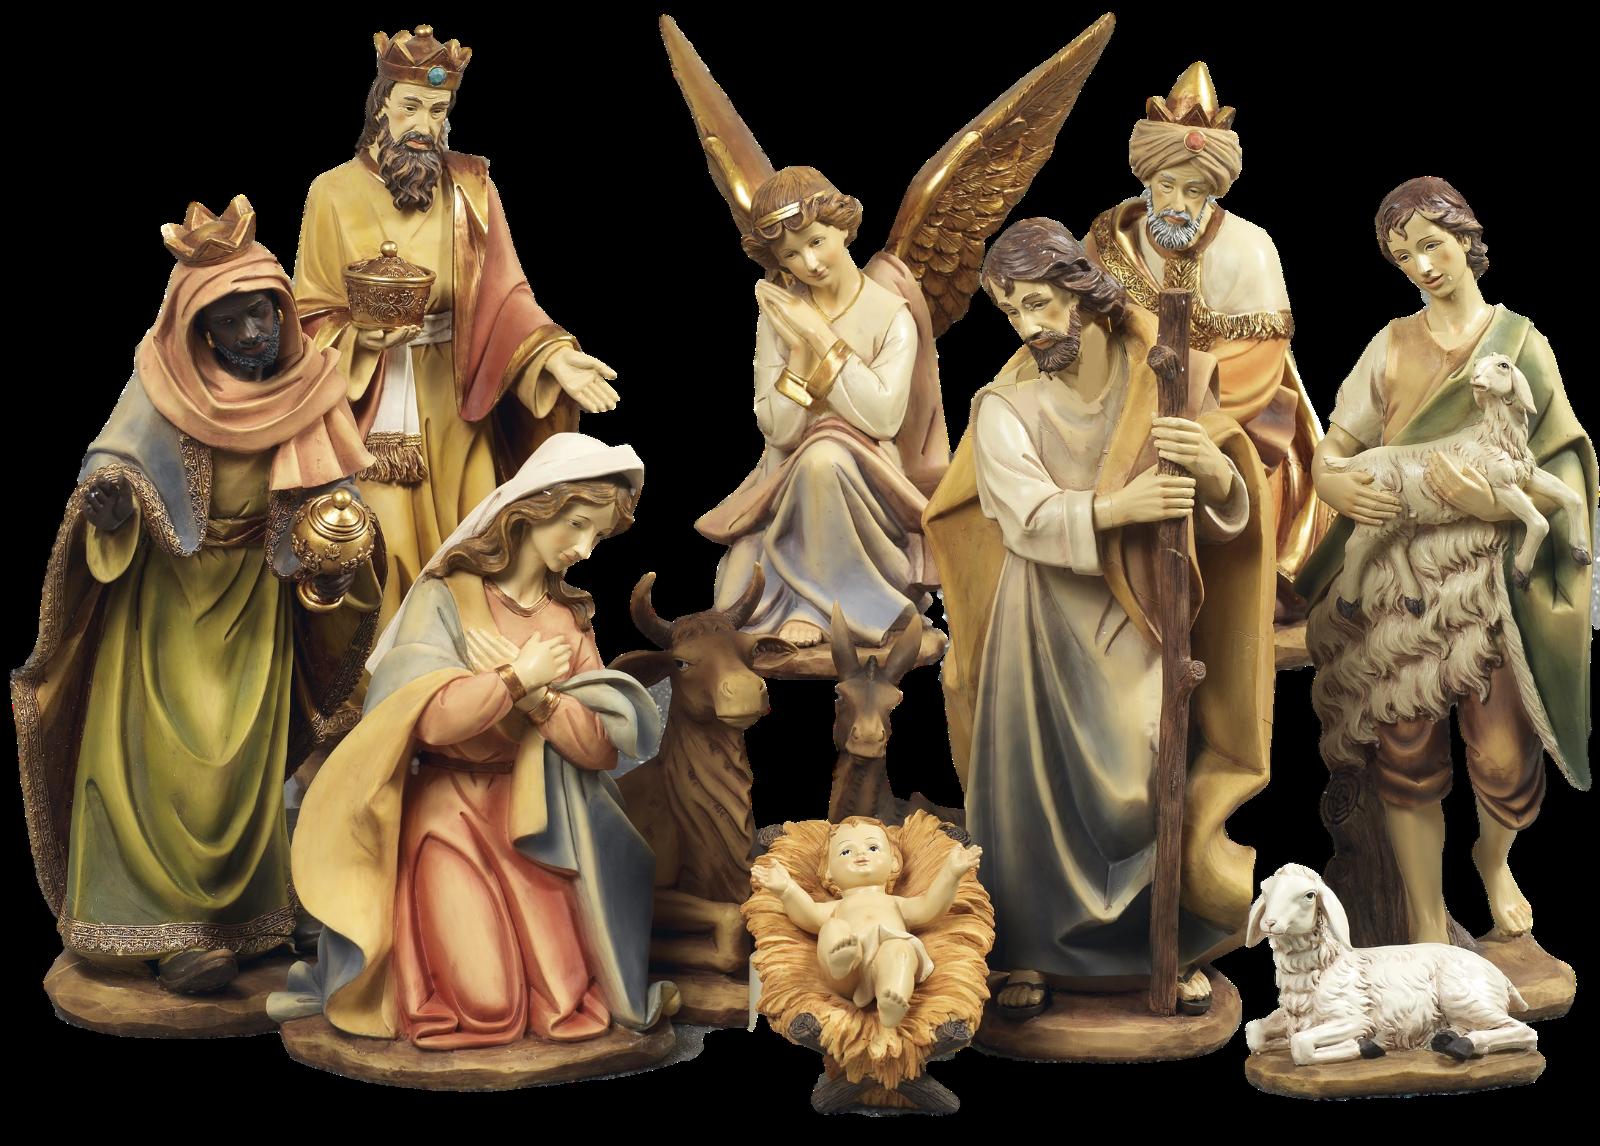 Set Presepe Natività, 11 43 cm, 11 Natività, soggetti in resina, by Paben b32902